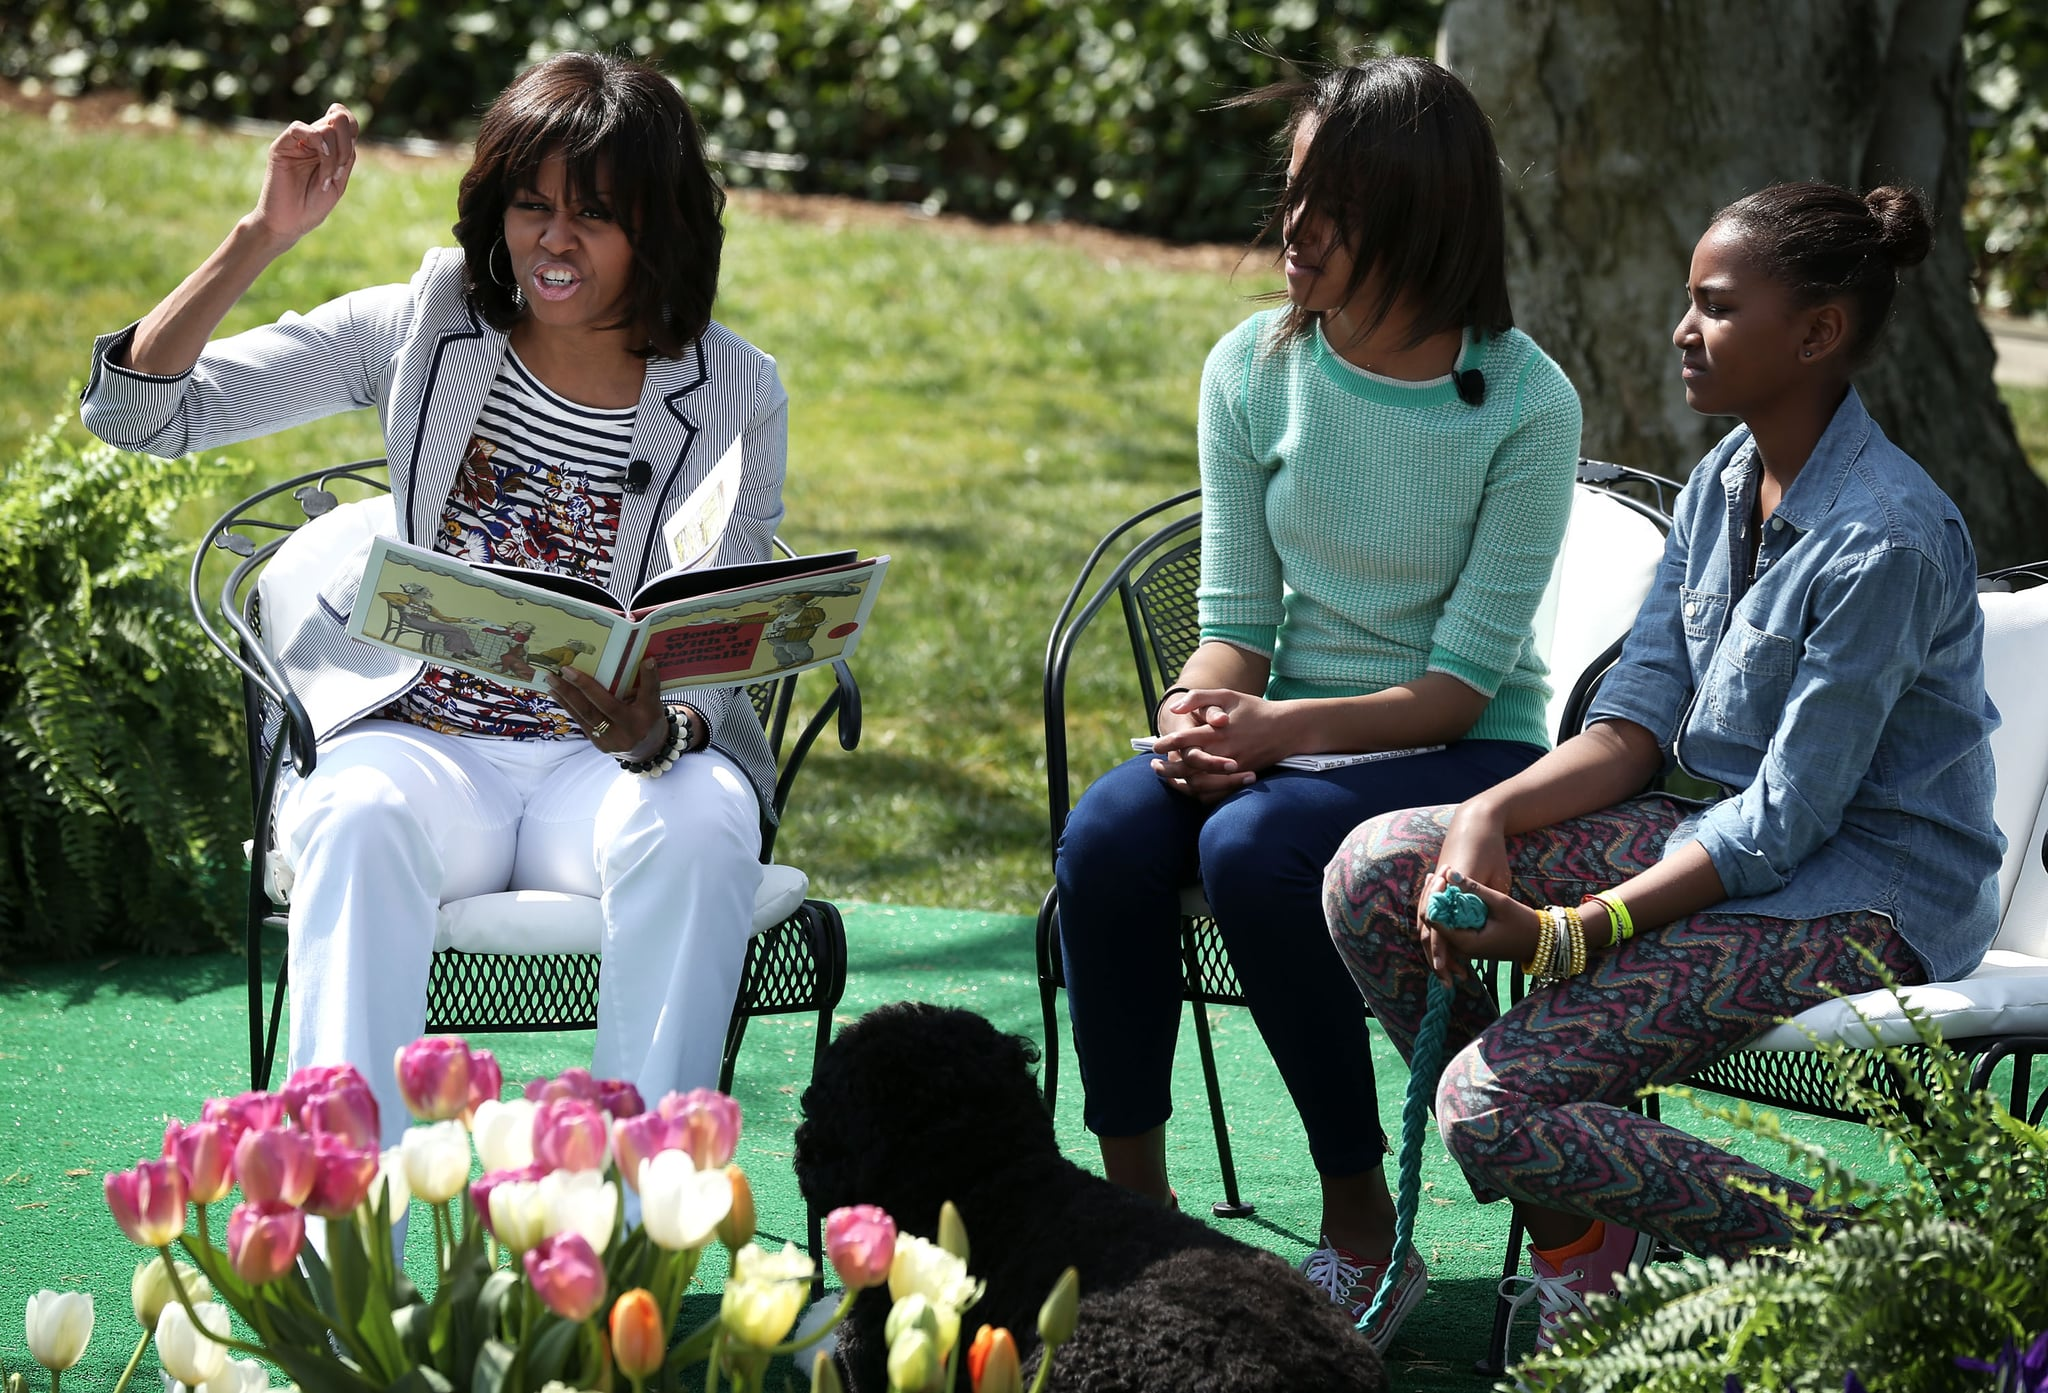 First Lady Michelle Obama With Malia and Sasha, 2013